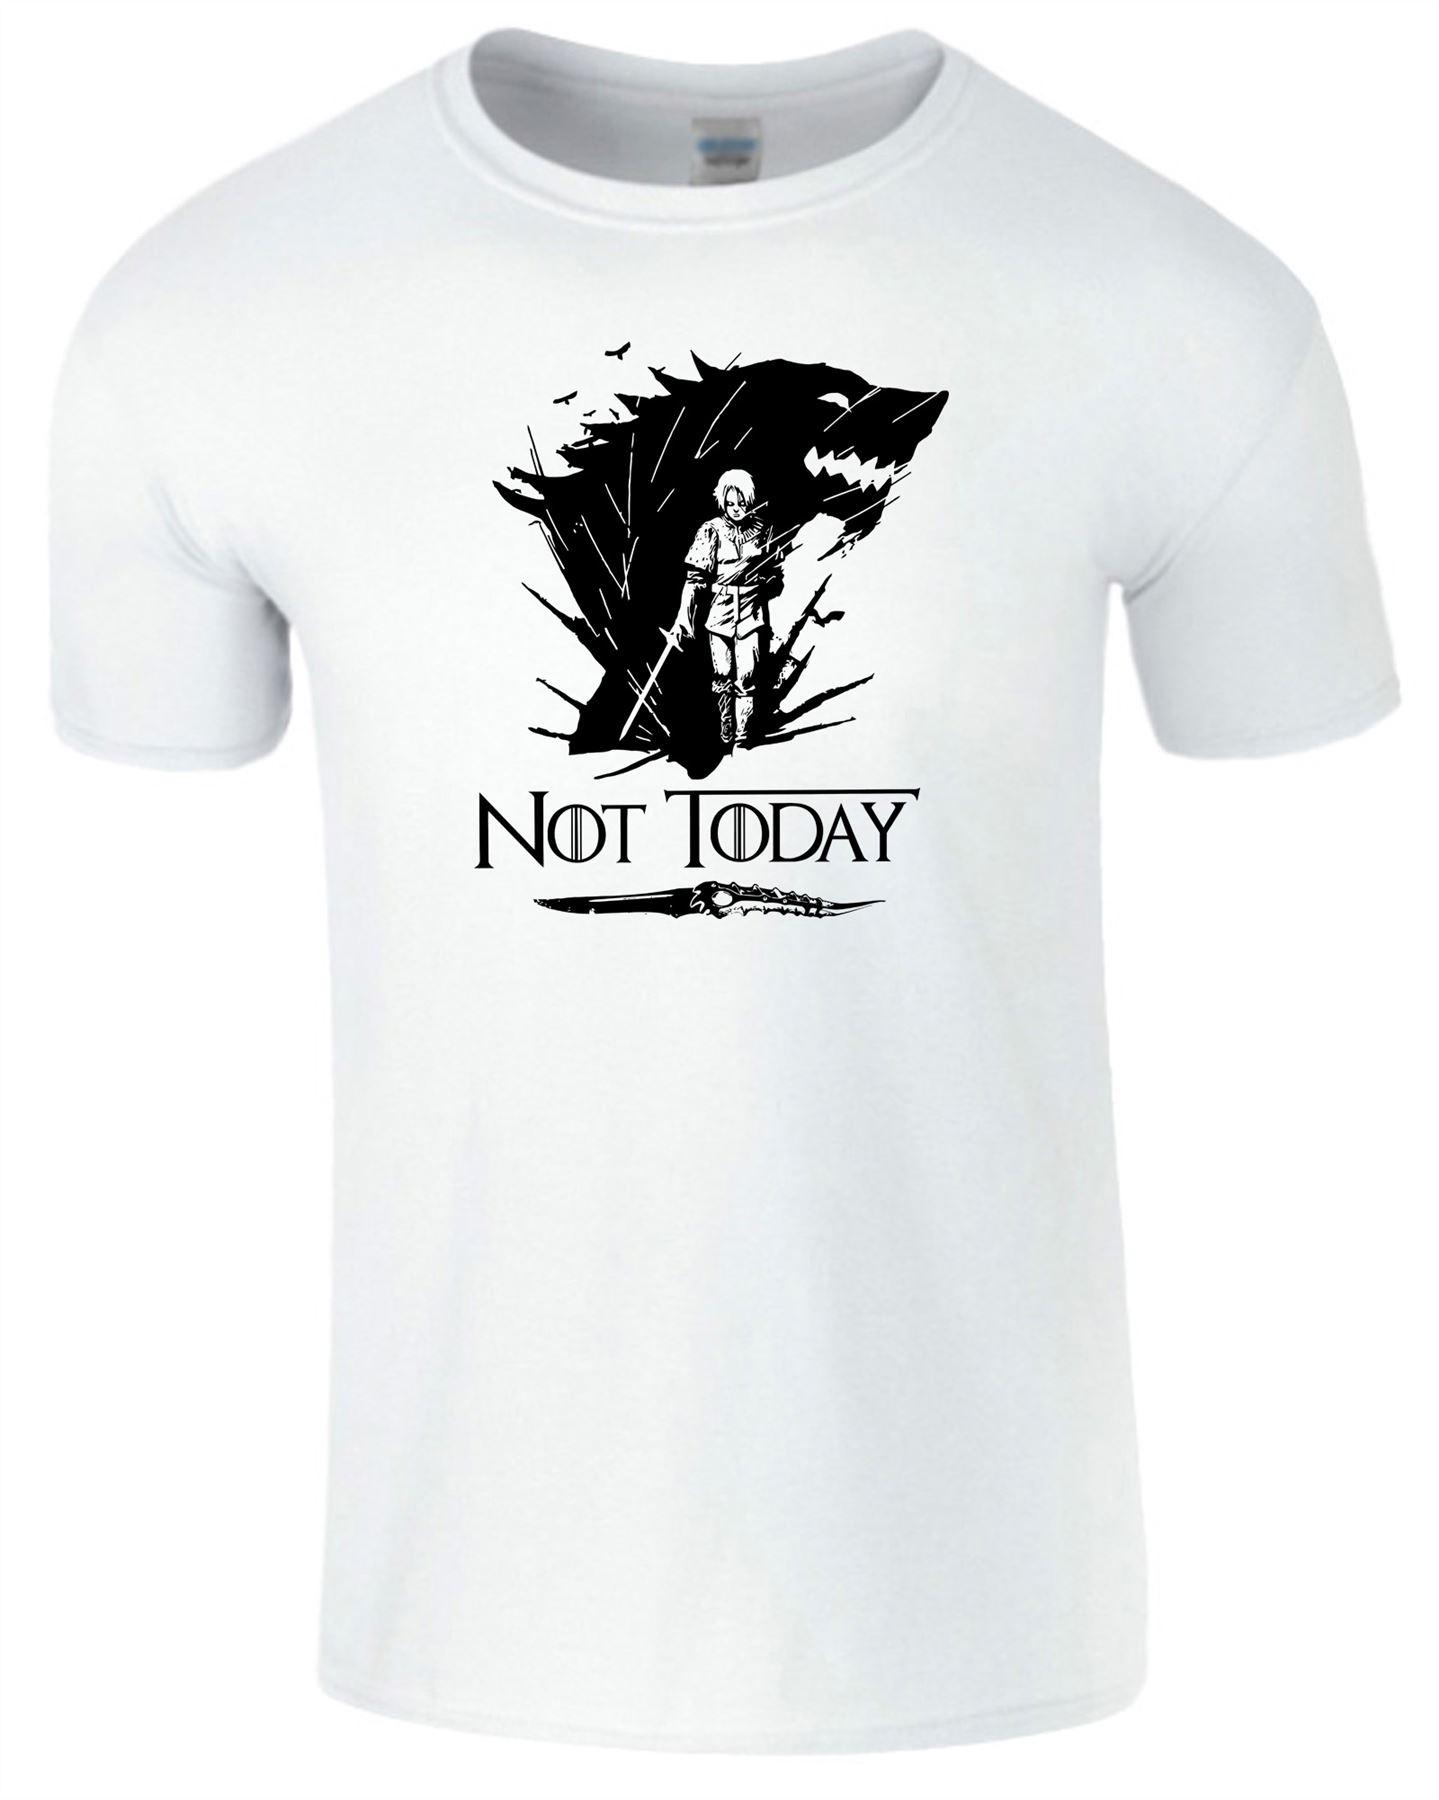 Arya-Stark-Not-Today-T-Shirt-Mens-Game-Season-Womens-Shirt-Adults-Unisex-Fit Indexbild 46